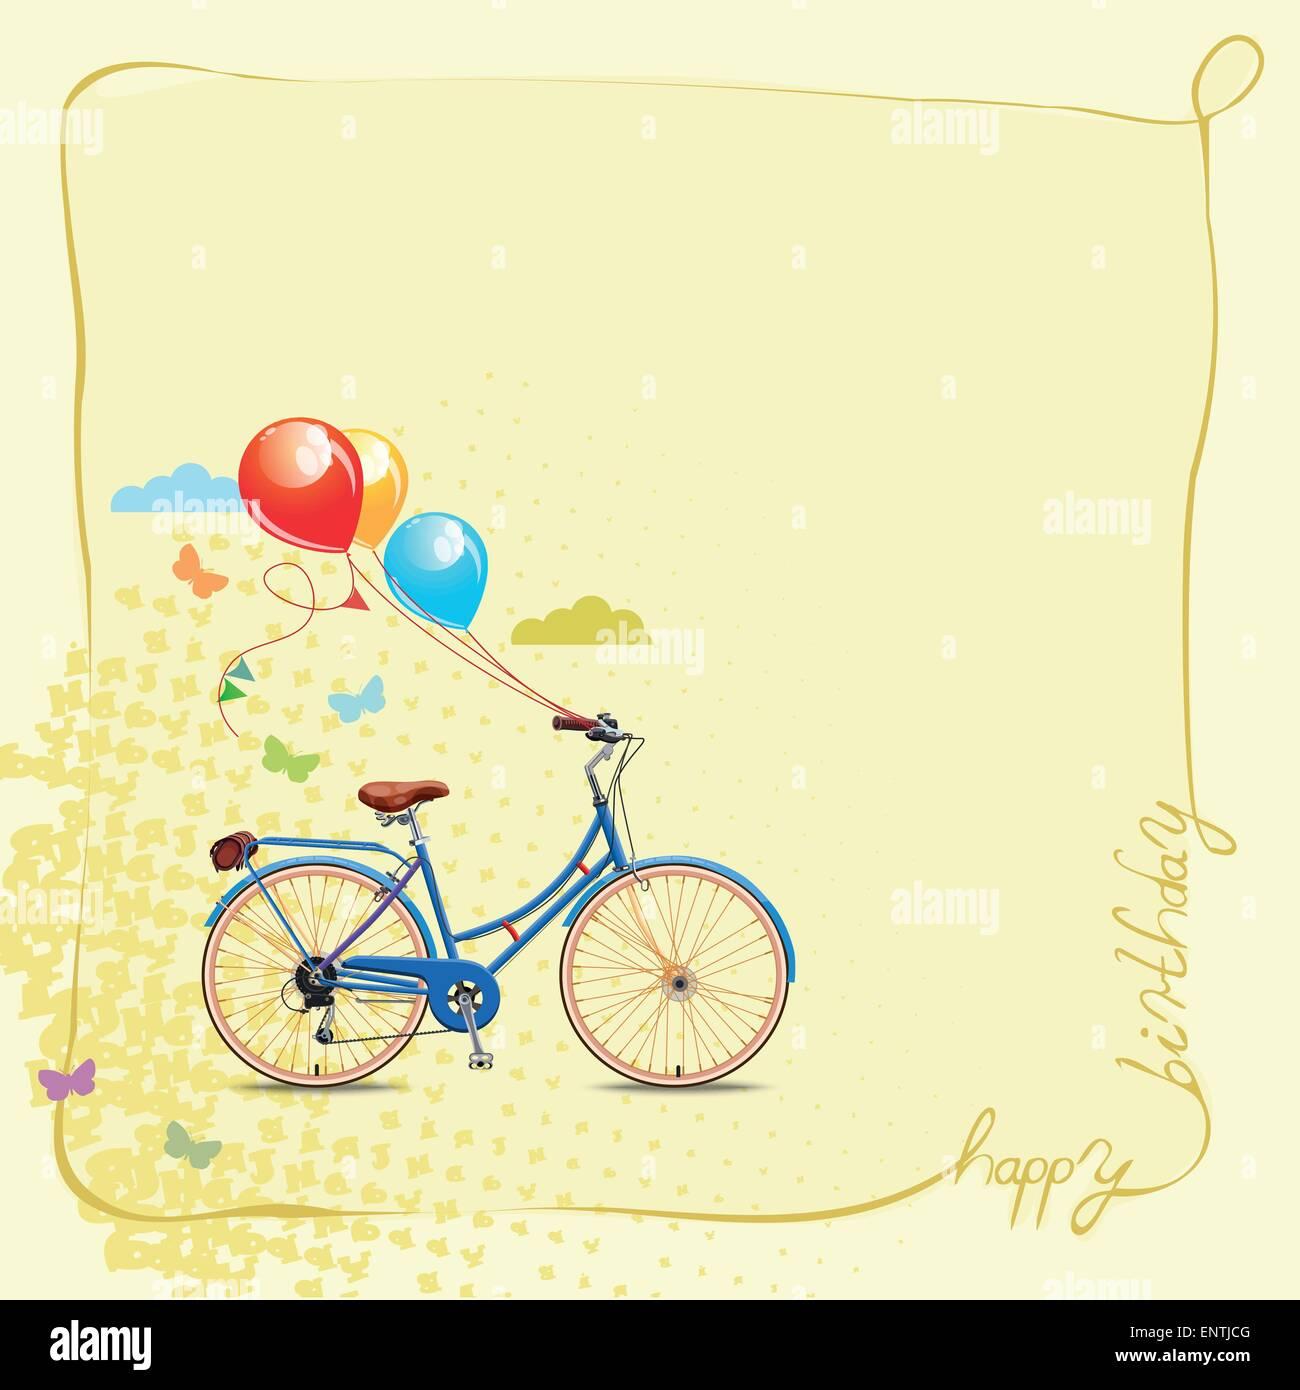 Happy birthday romantic greeting card bicycle and balloons vintage happy birthday romantic greeting card bicycle and balloons vintage style m4hsunfo